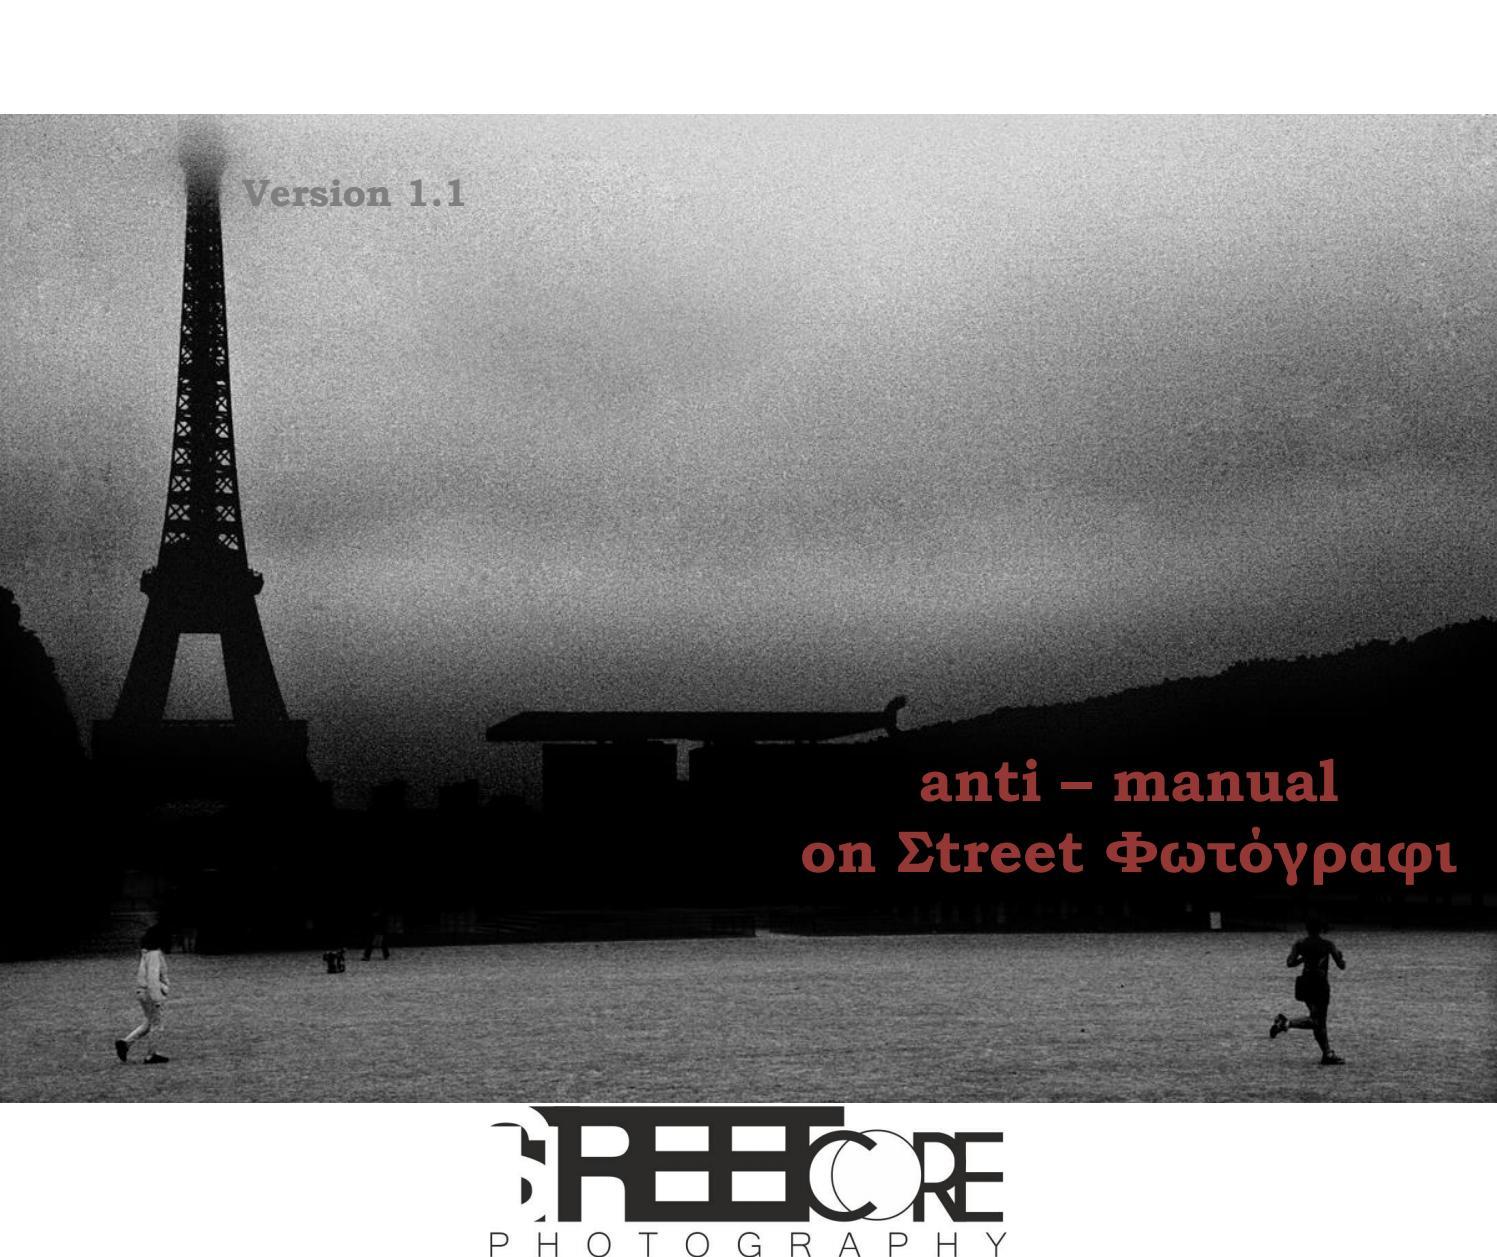 V.1.1 Anti-manual on Street Photography